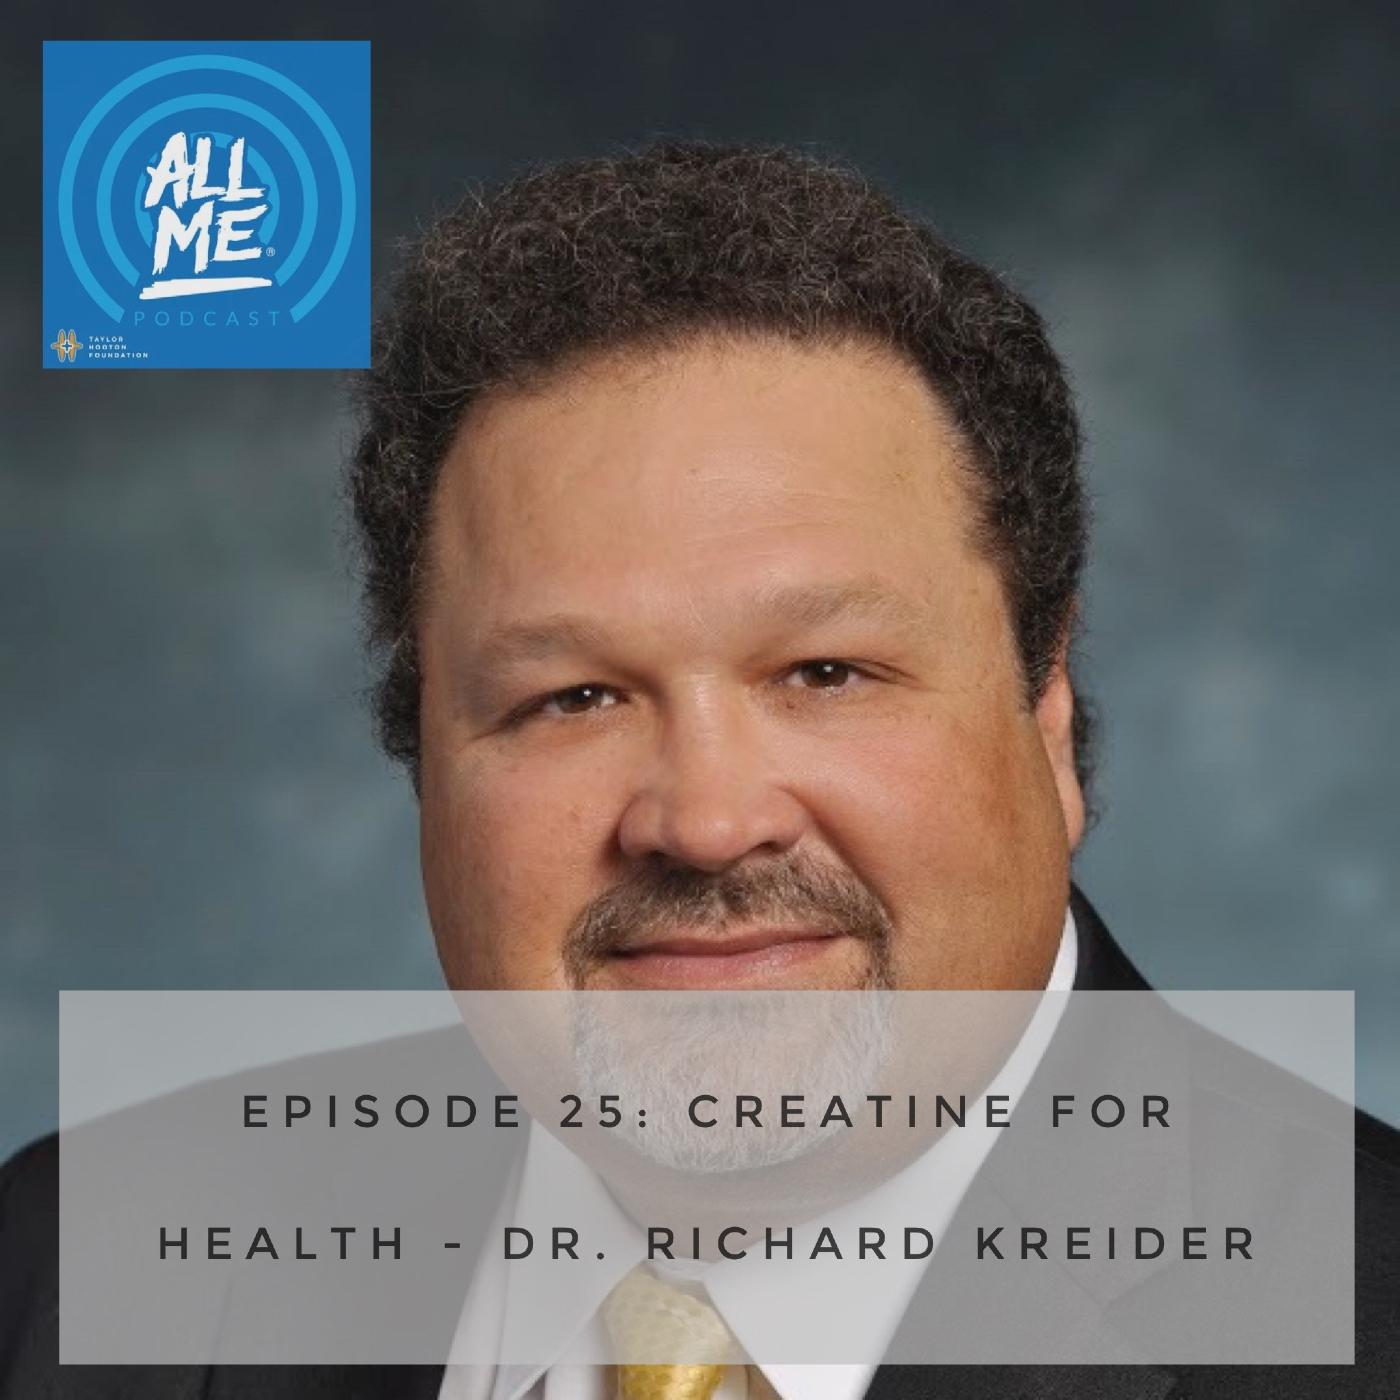 Episode 25: Creatine for Health & Performance - Dr. Richard Kreider